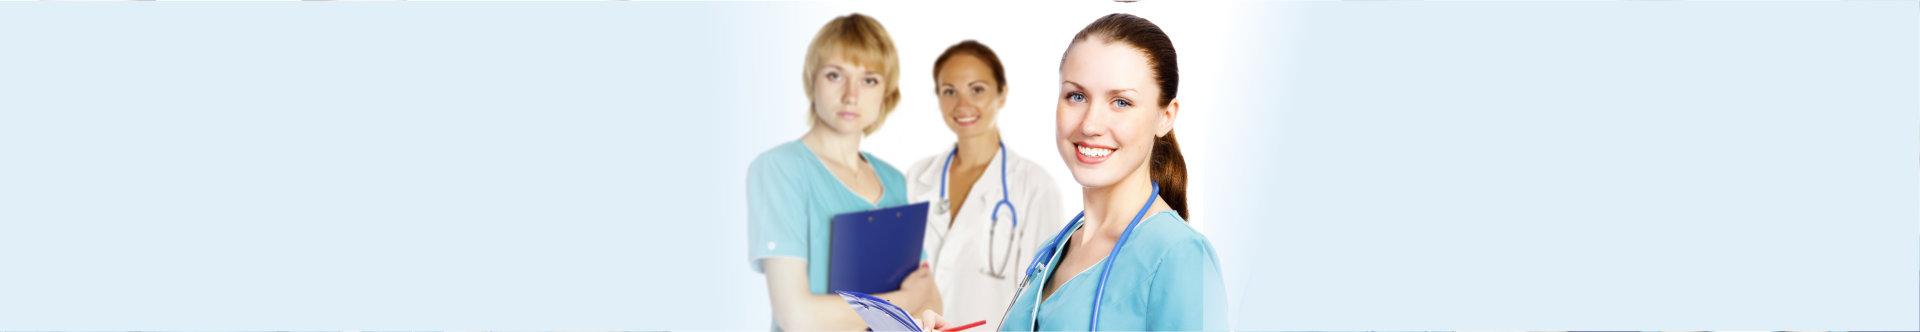 registered nurses smiling